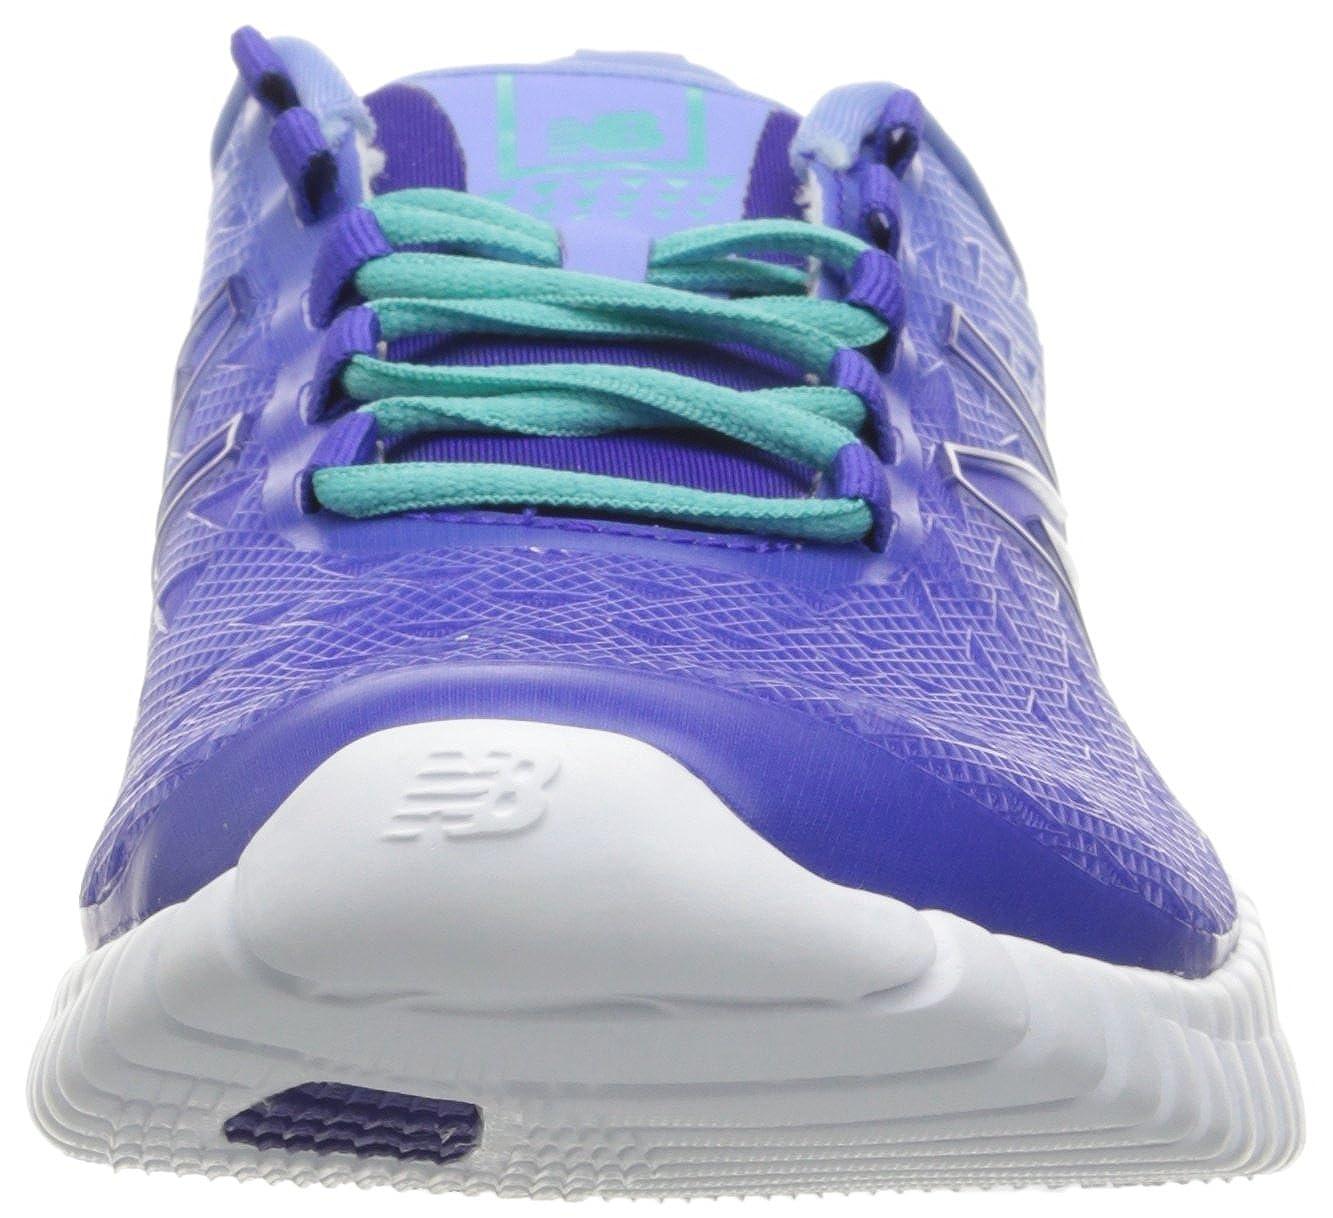 0cc8b3e19bc3 ... New Balance Women  s 99 99 99 Training Fitness Shoes B019DLHE4Q Parent  eeb330 ...